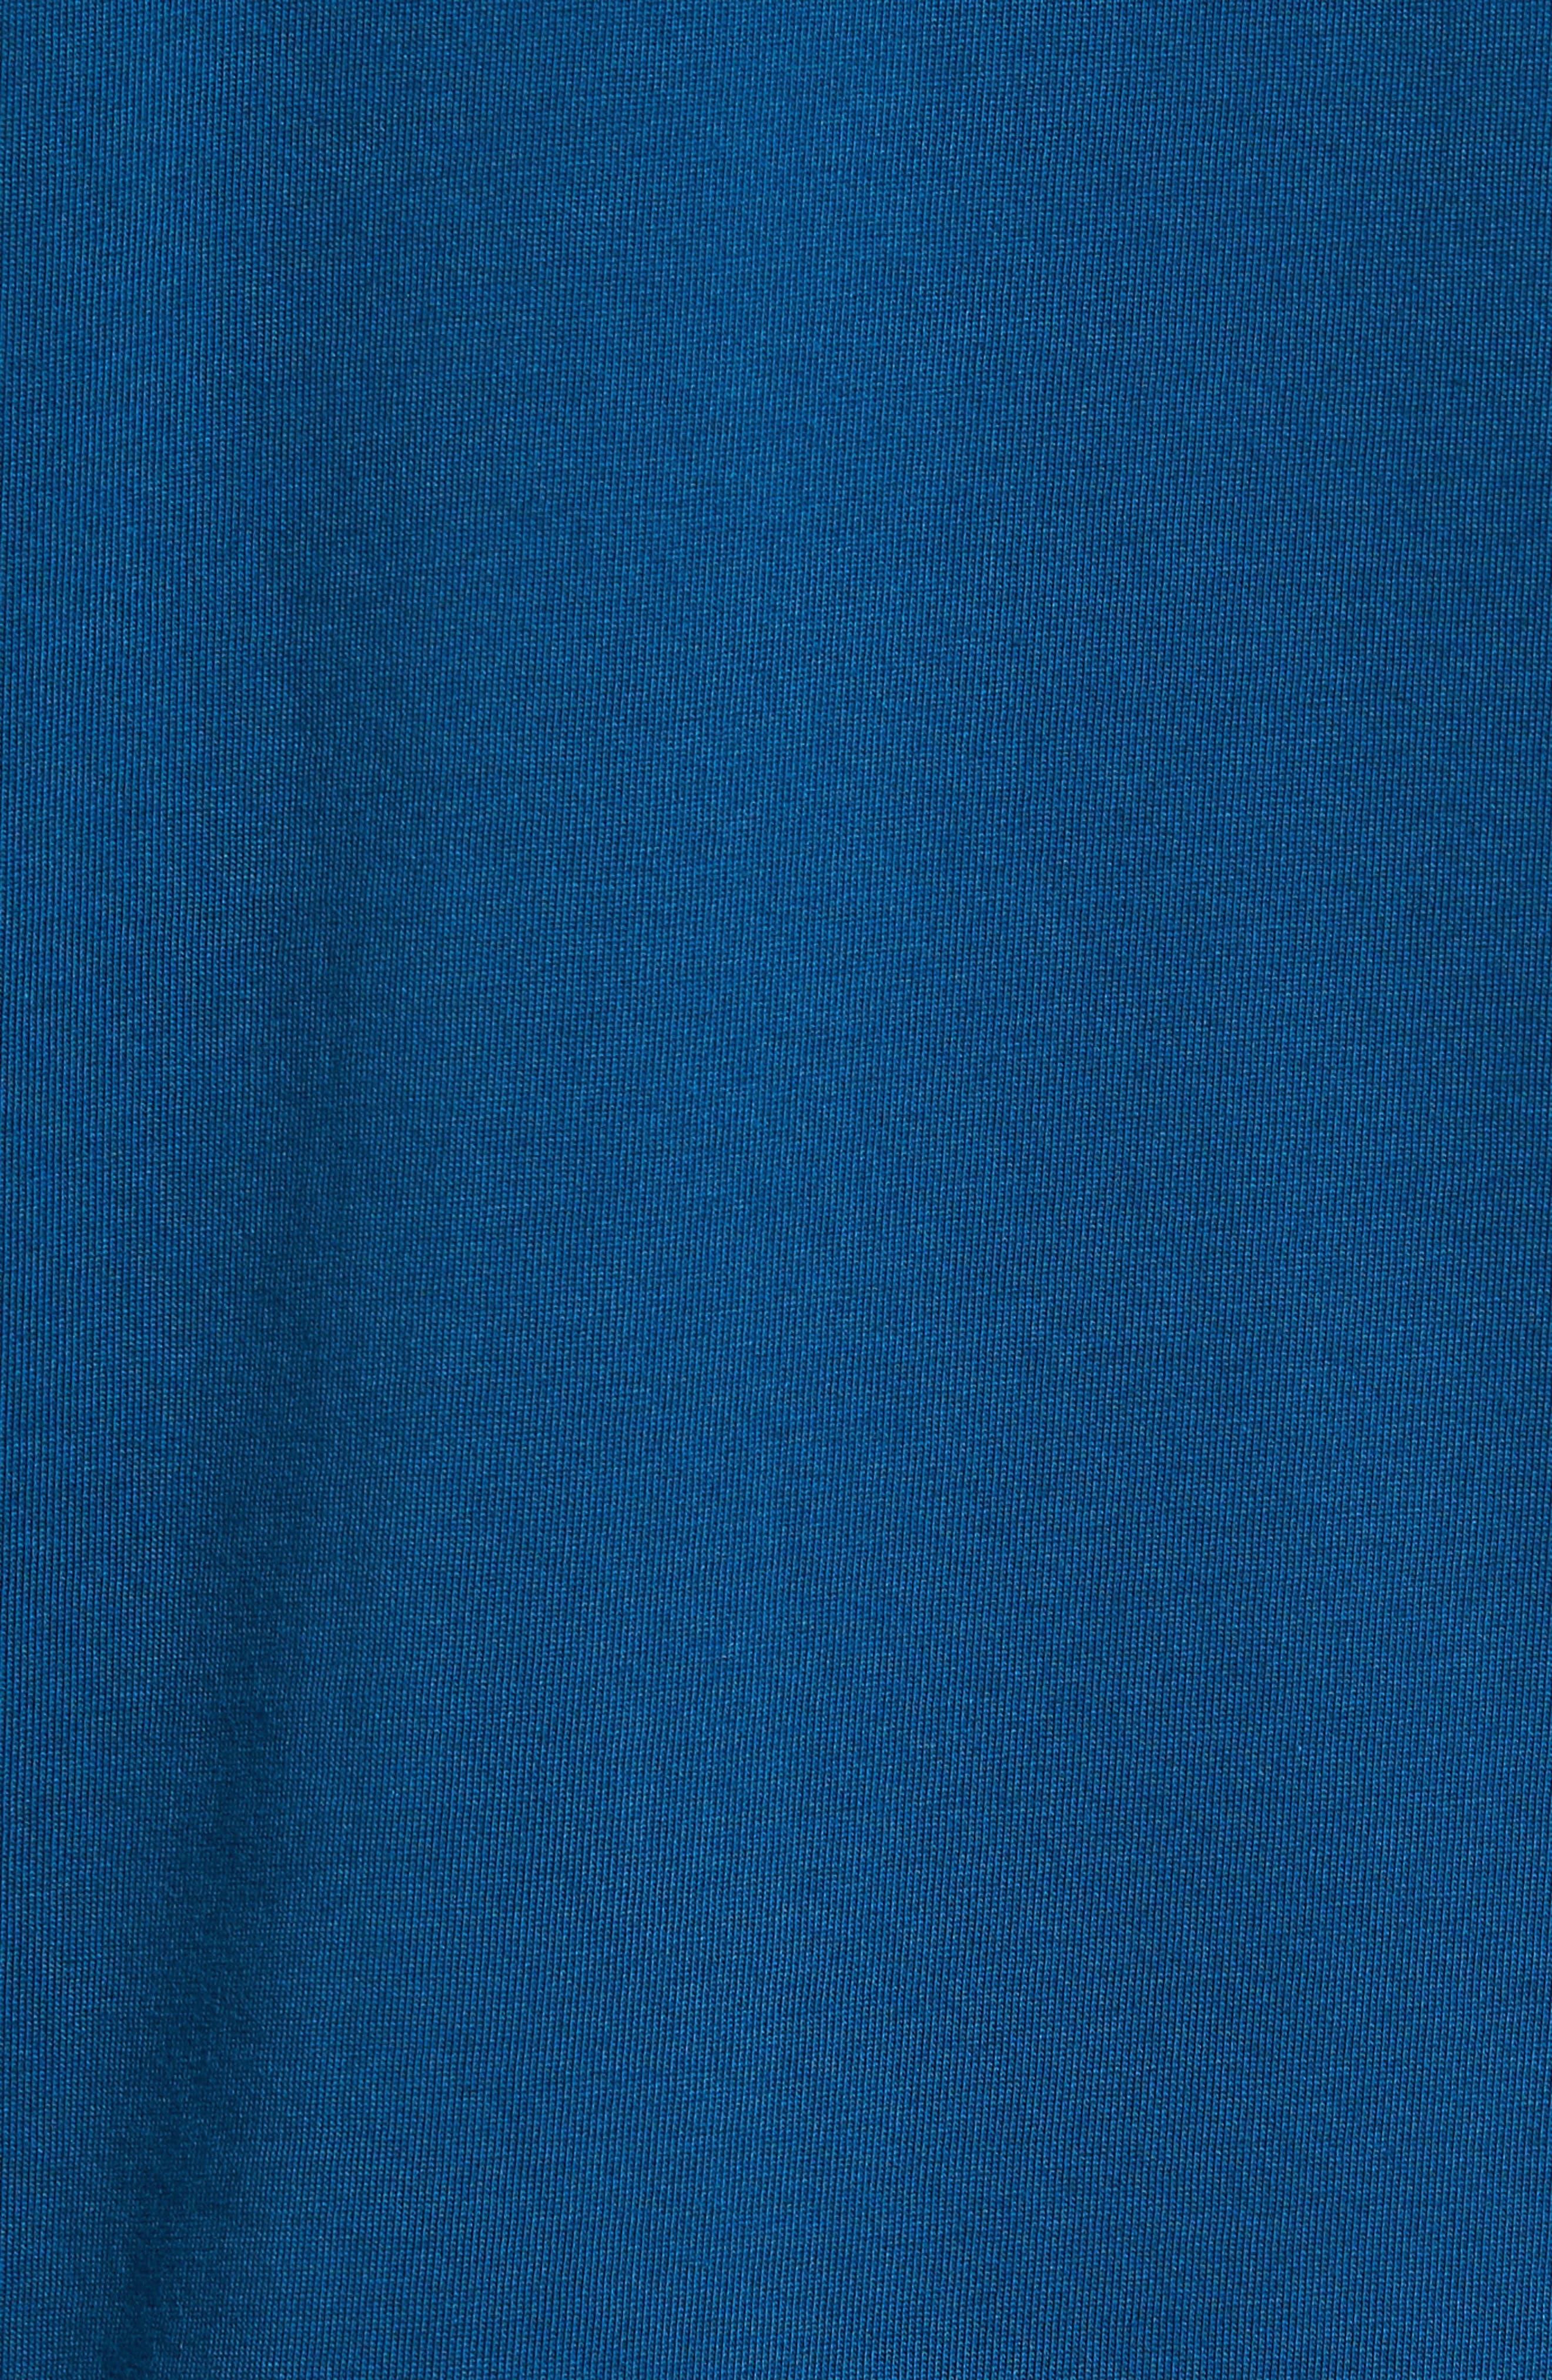 Alternate Image 5  - Tommy Bahama New Bali Skyline T-Shirt